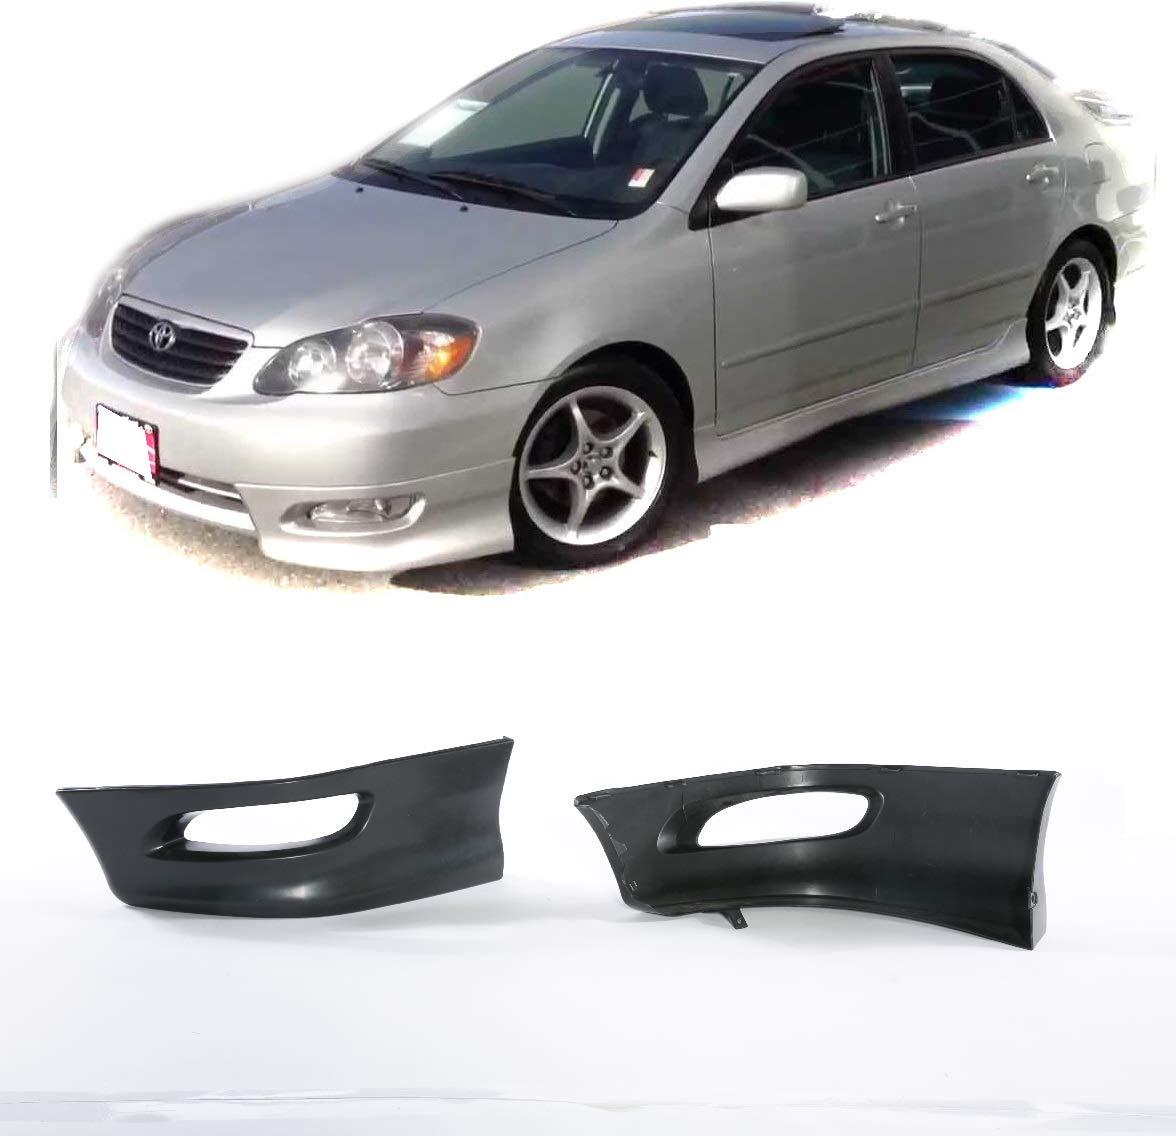 Toyota Corolla 05-08 S Style Front L+R Lower Body Kit Lip Spoiler PP Black